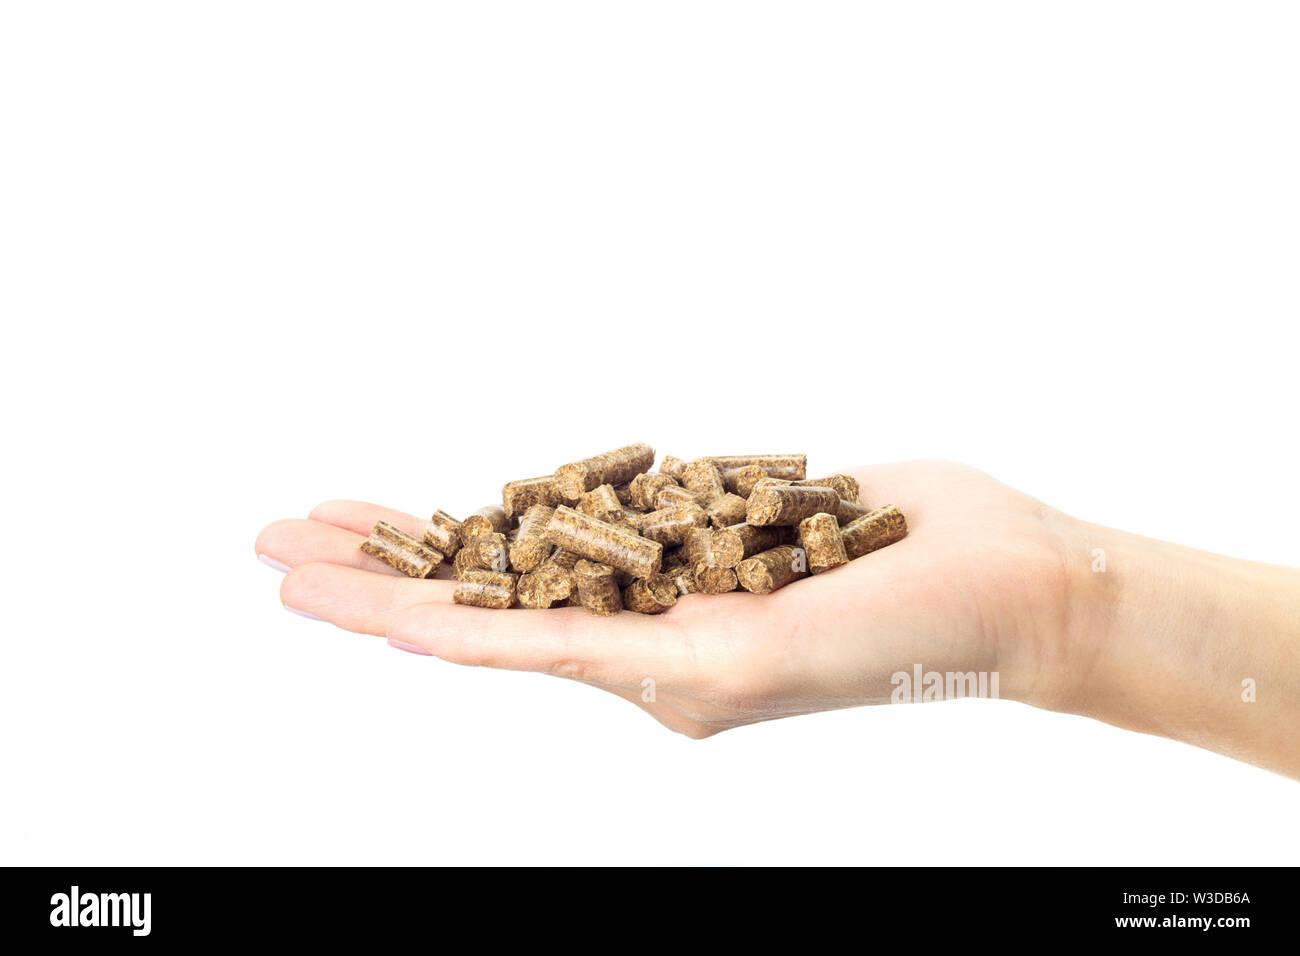 Human hand holding en bois de chauffage Photo Stock